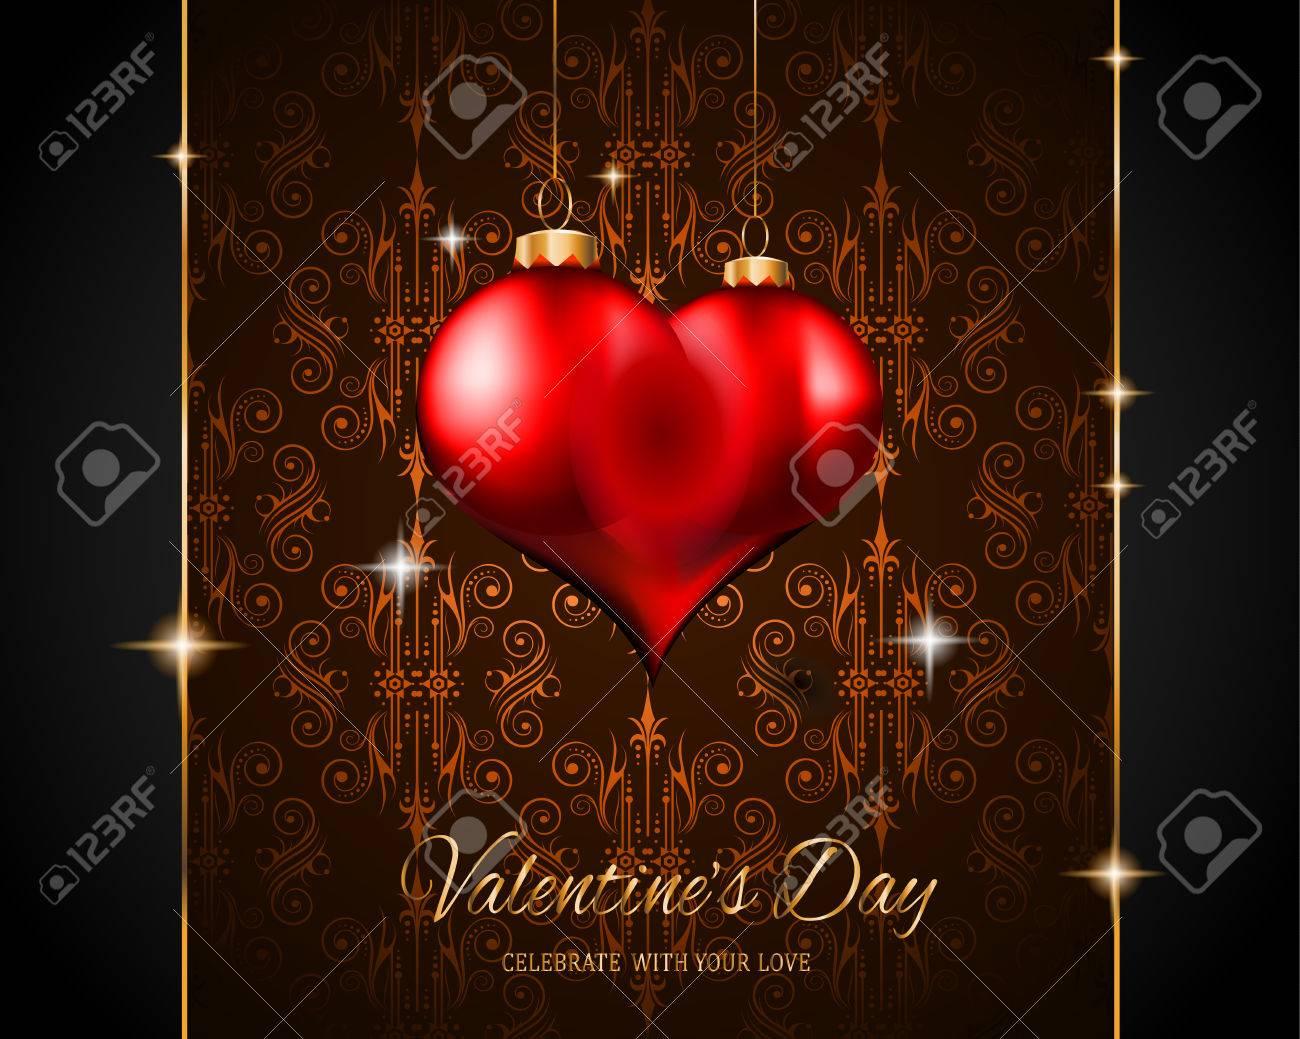 Valentine\'s Day Restaurant Menu Template Background For Romantic ...